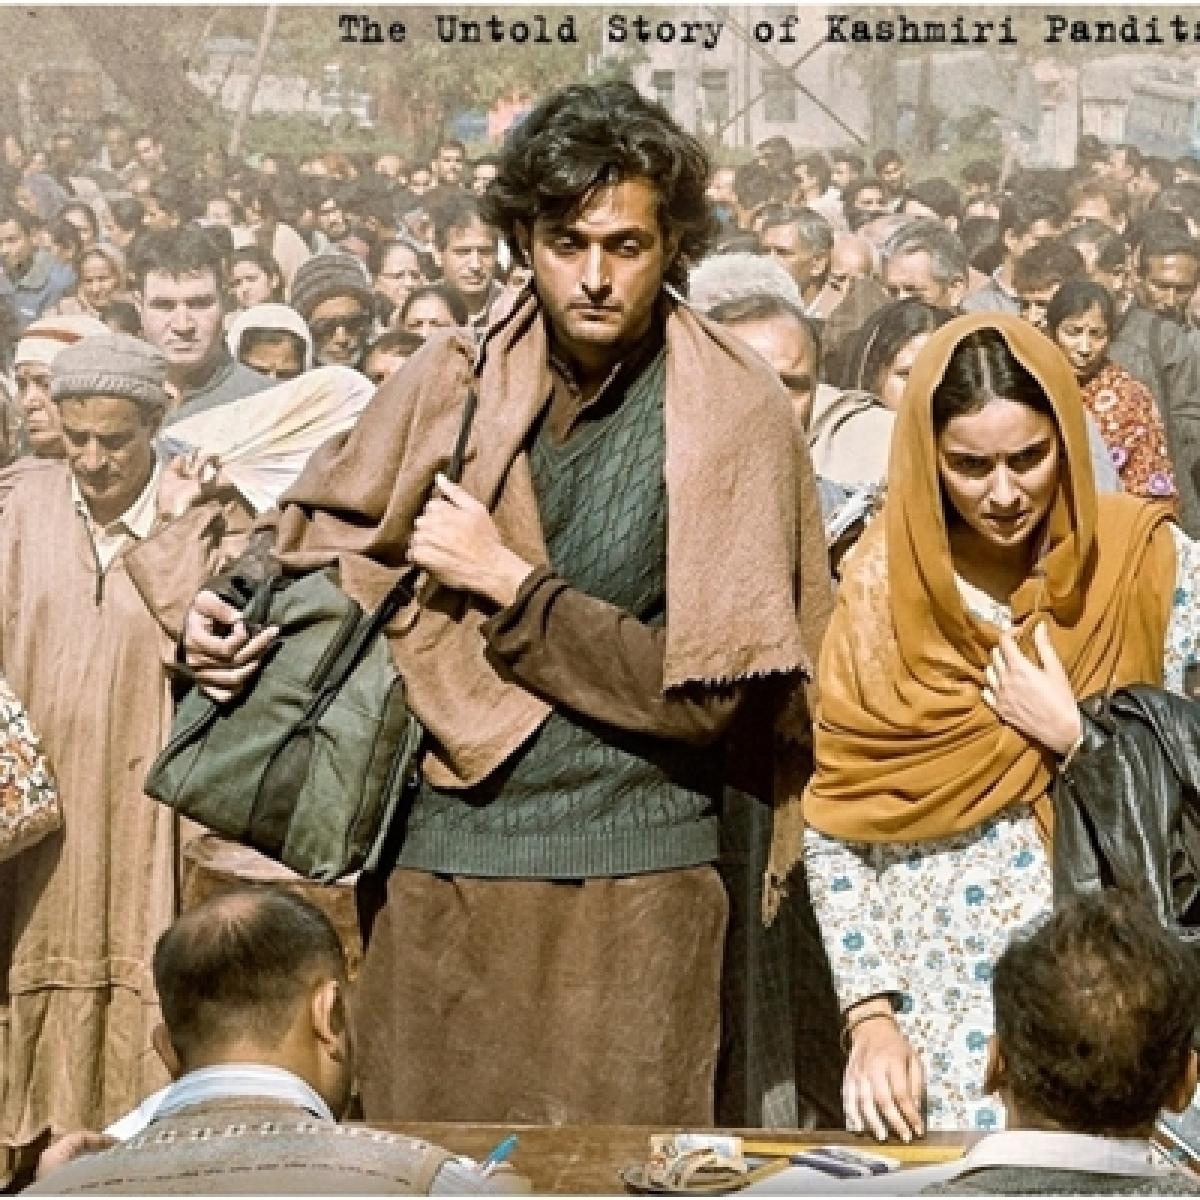 Shikhara Movie Review: Vidhu Vinod Chopra's movie stresses upon plight of Kashmiri Pandits